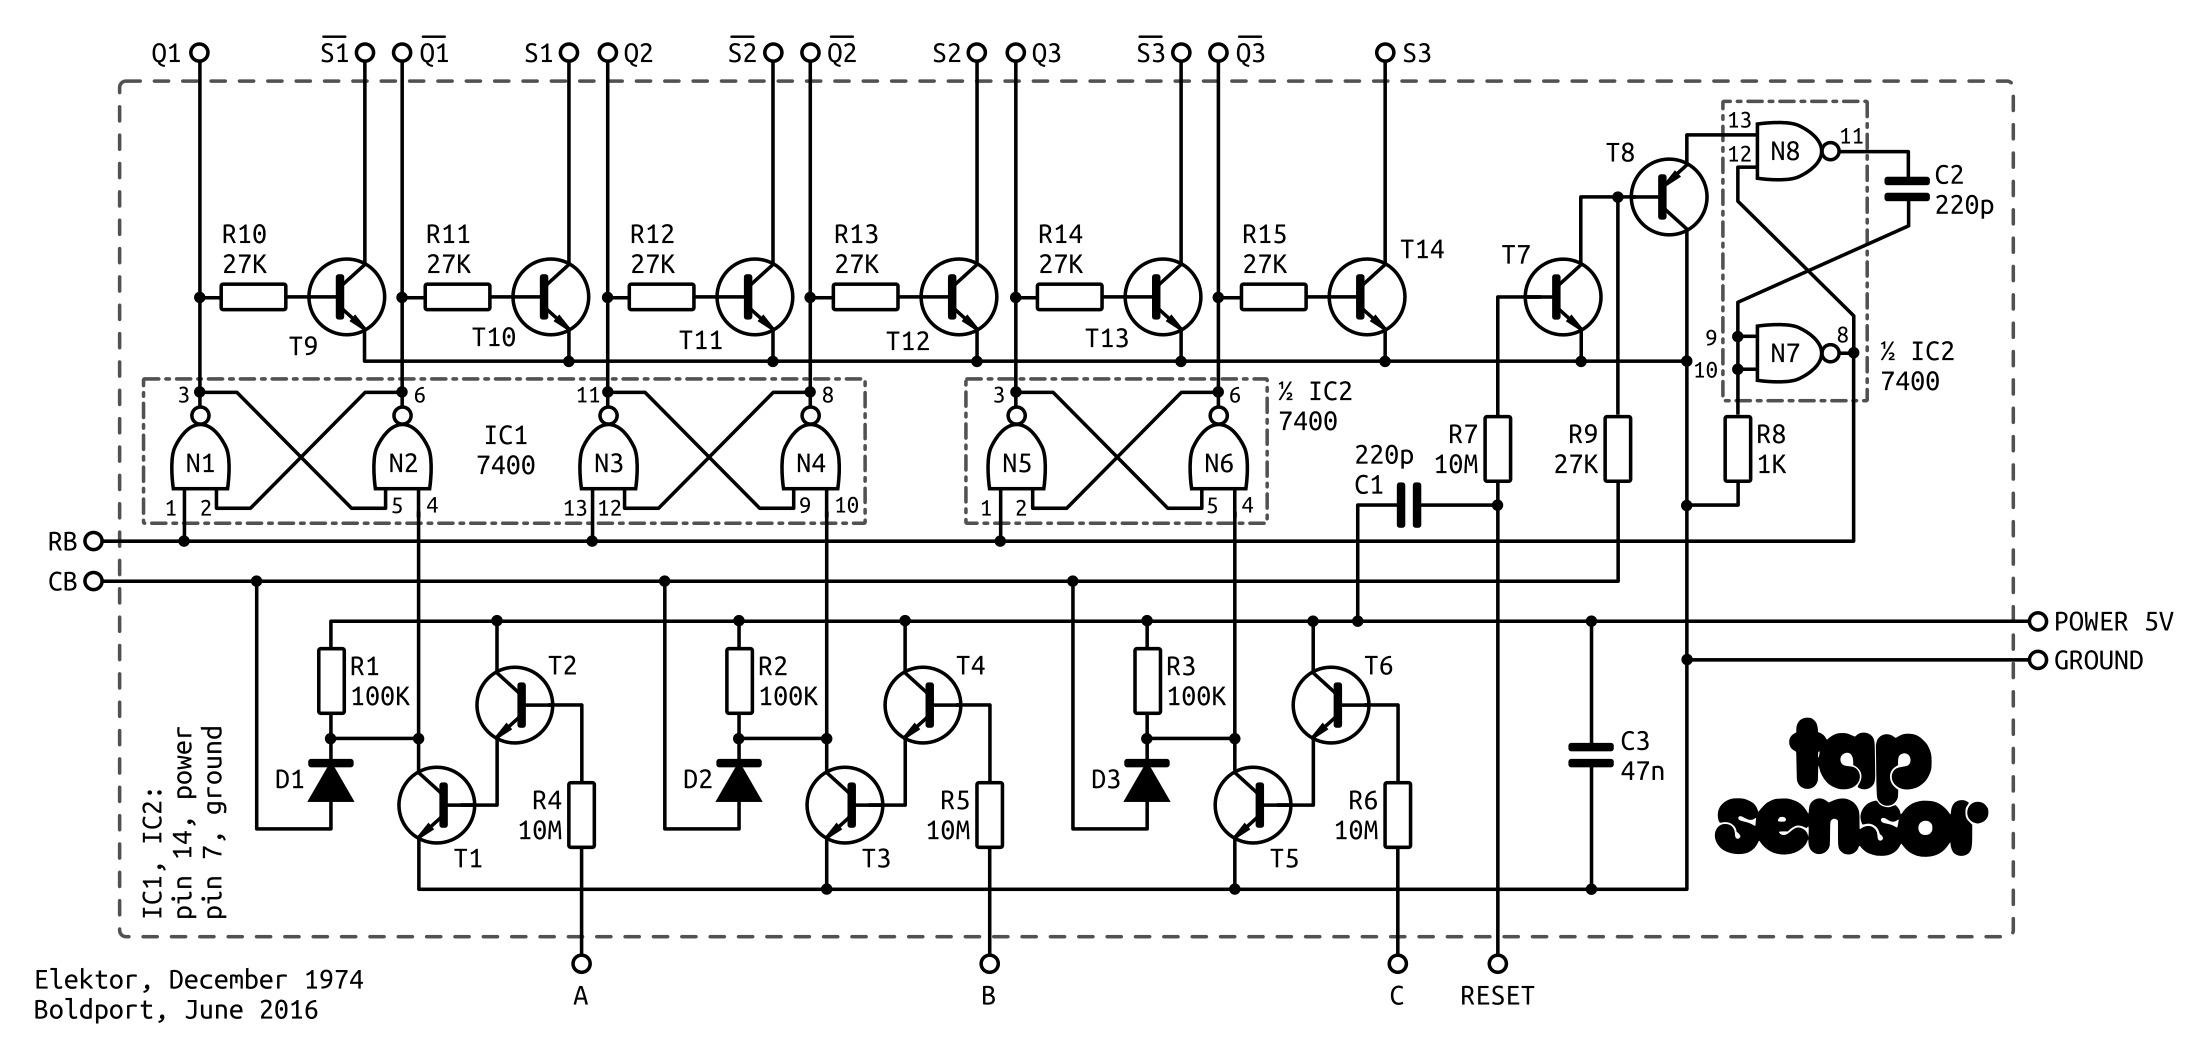 reading circuit board schematics